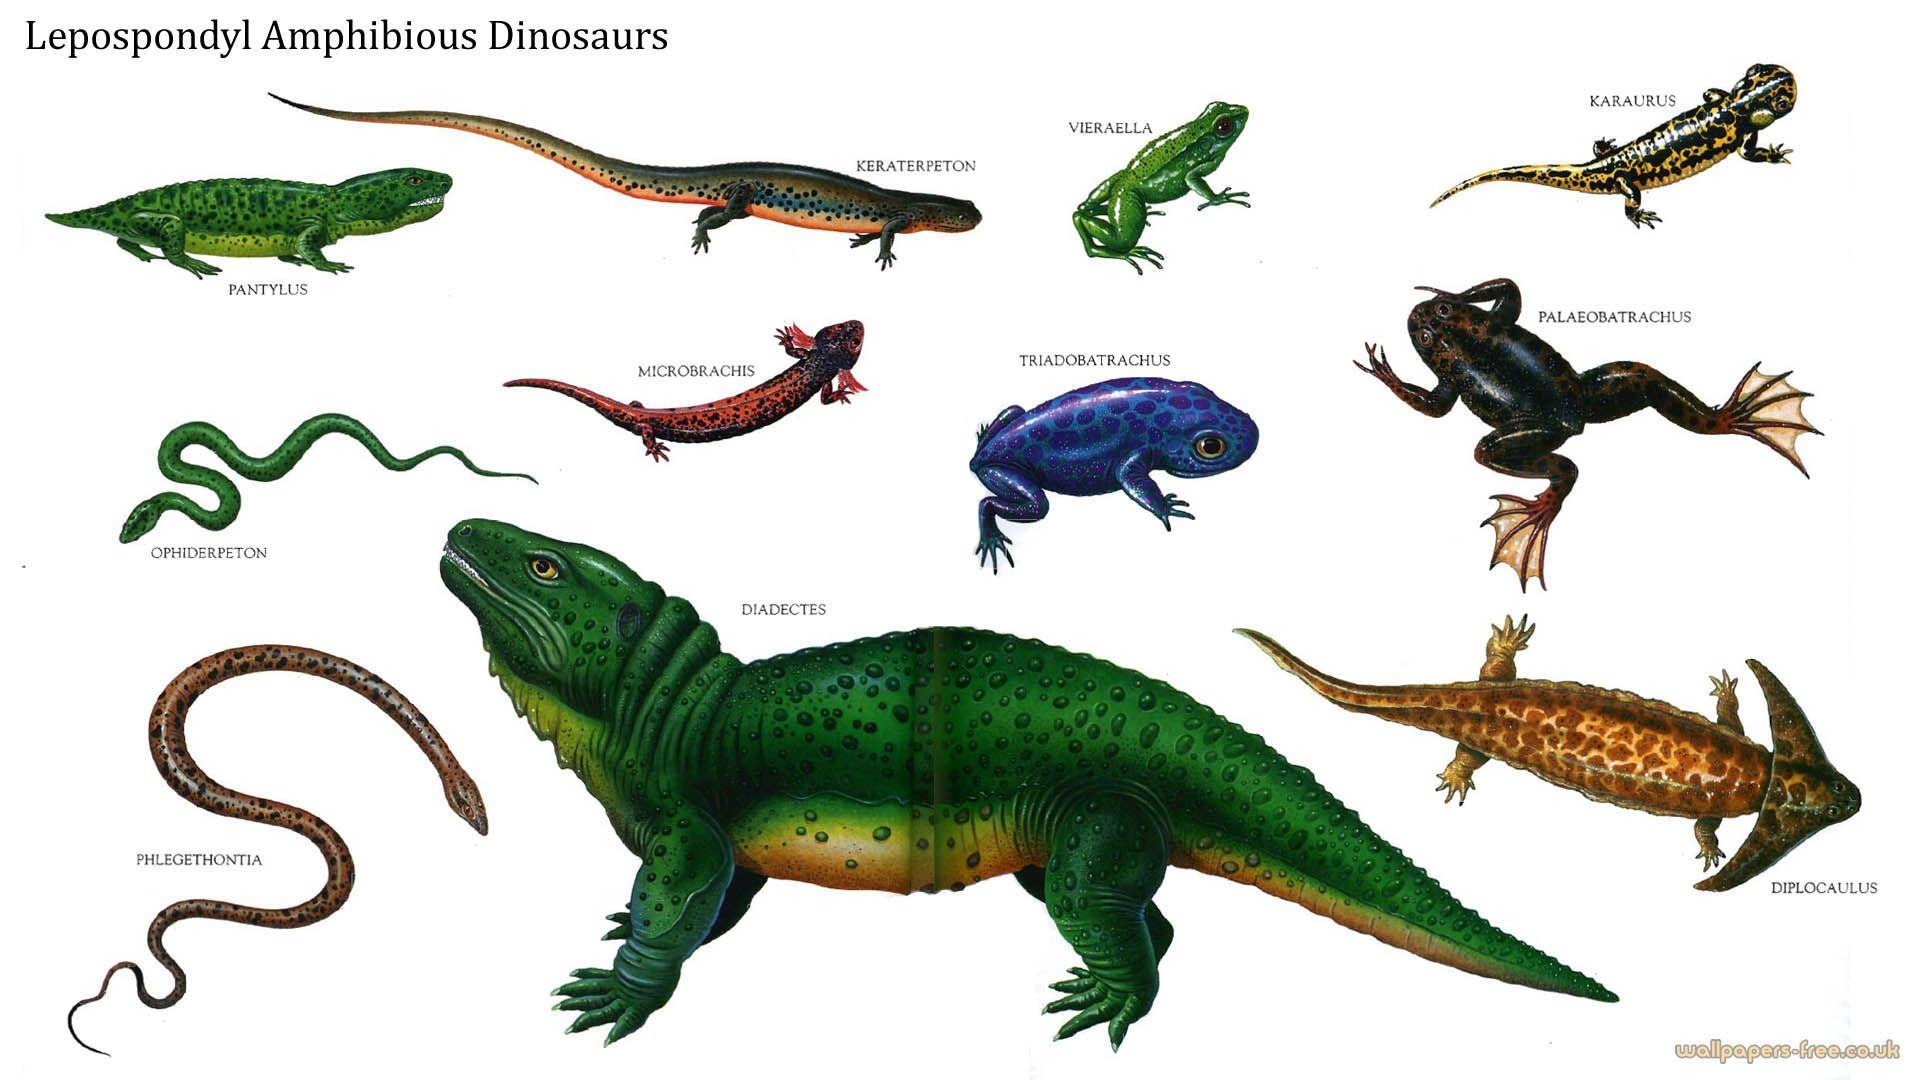 Lepospondyls Amphibious Dinosaurs Image 231397 Jpg 1920 1080 Dinosaur Prehistoric Creatures Dinosaur Images